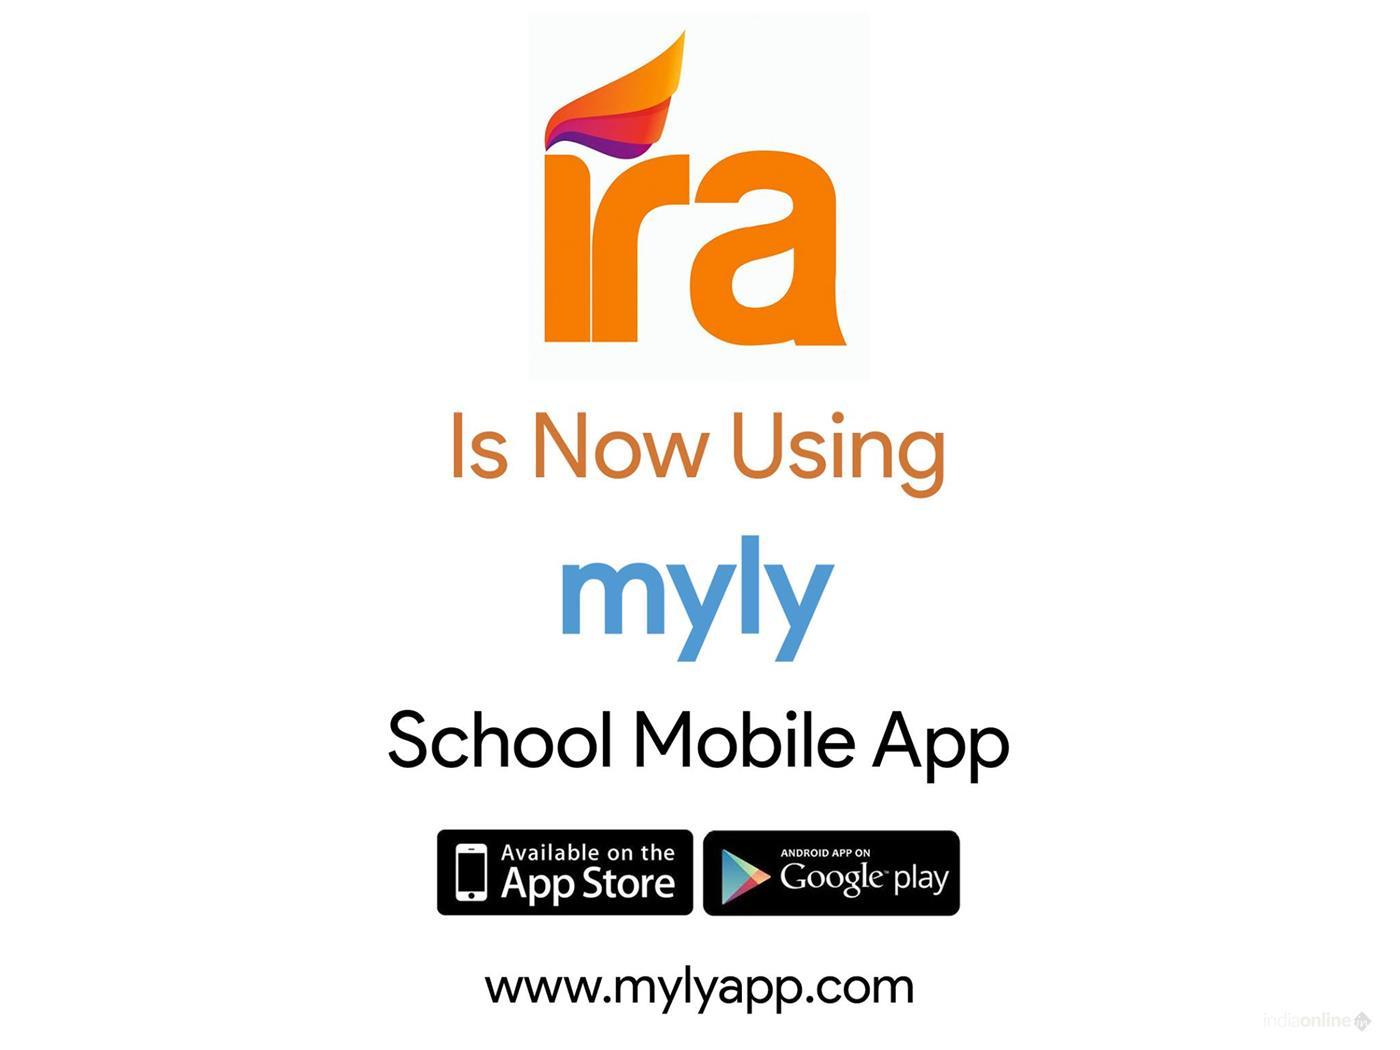 MYLY School Mobile App